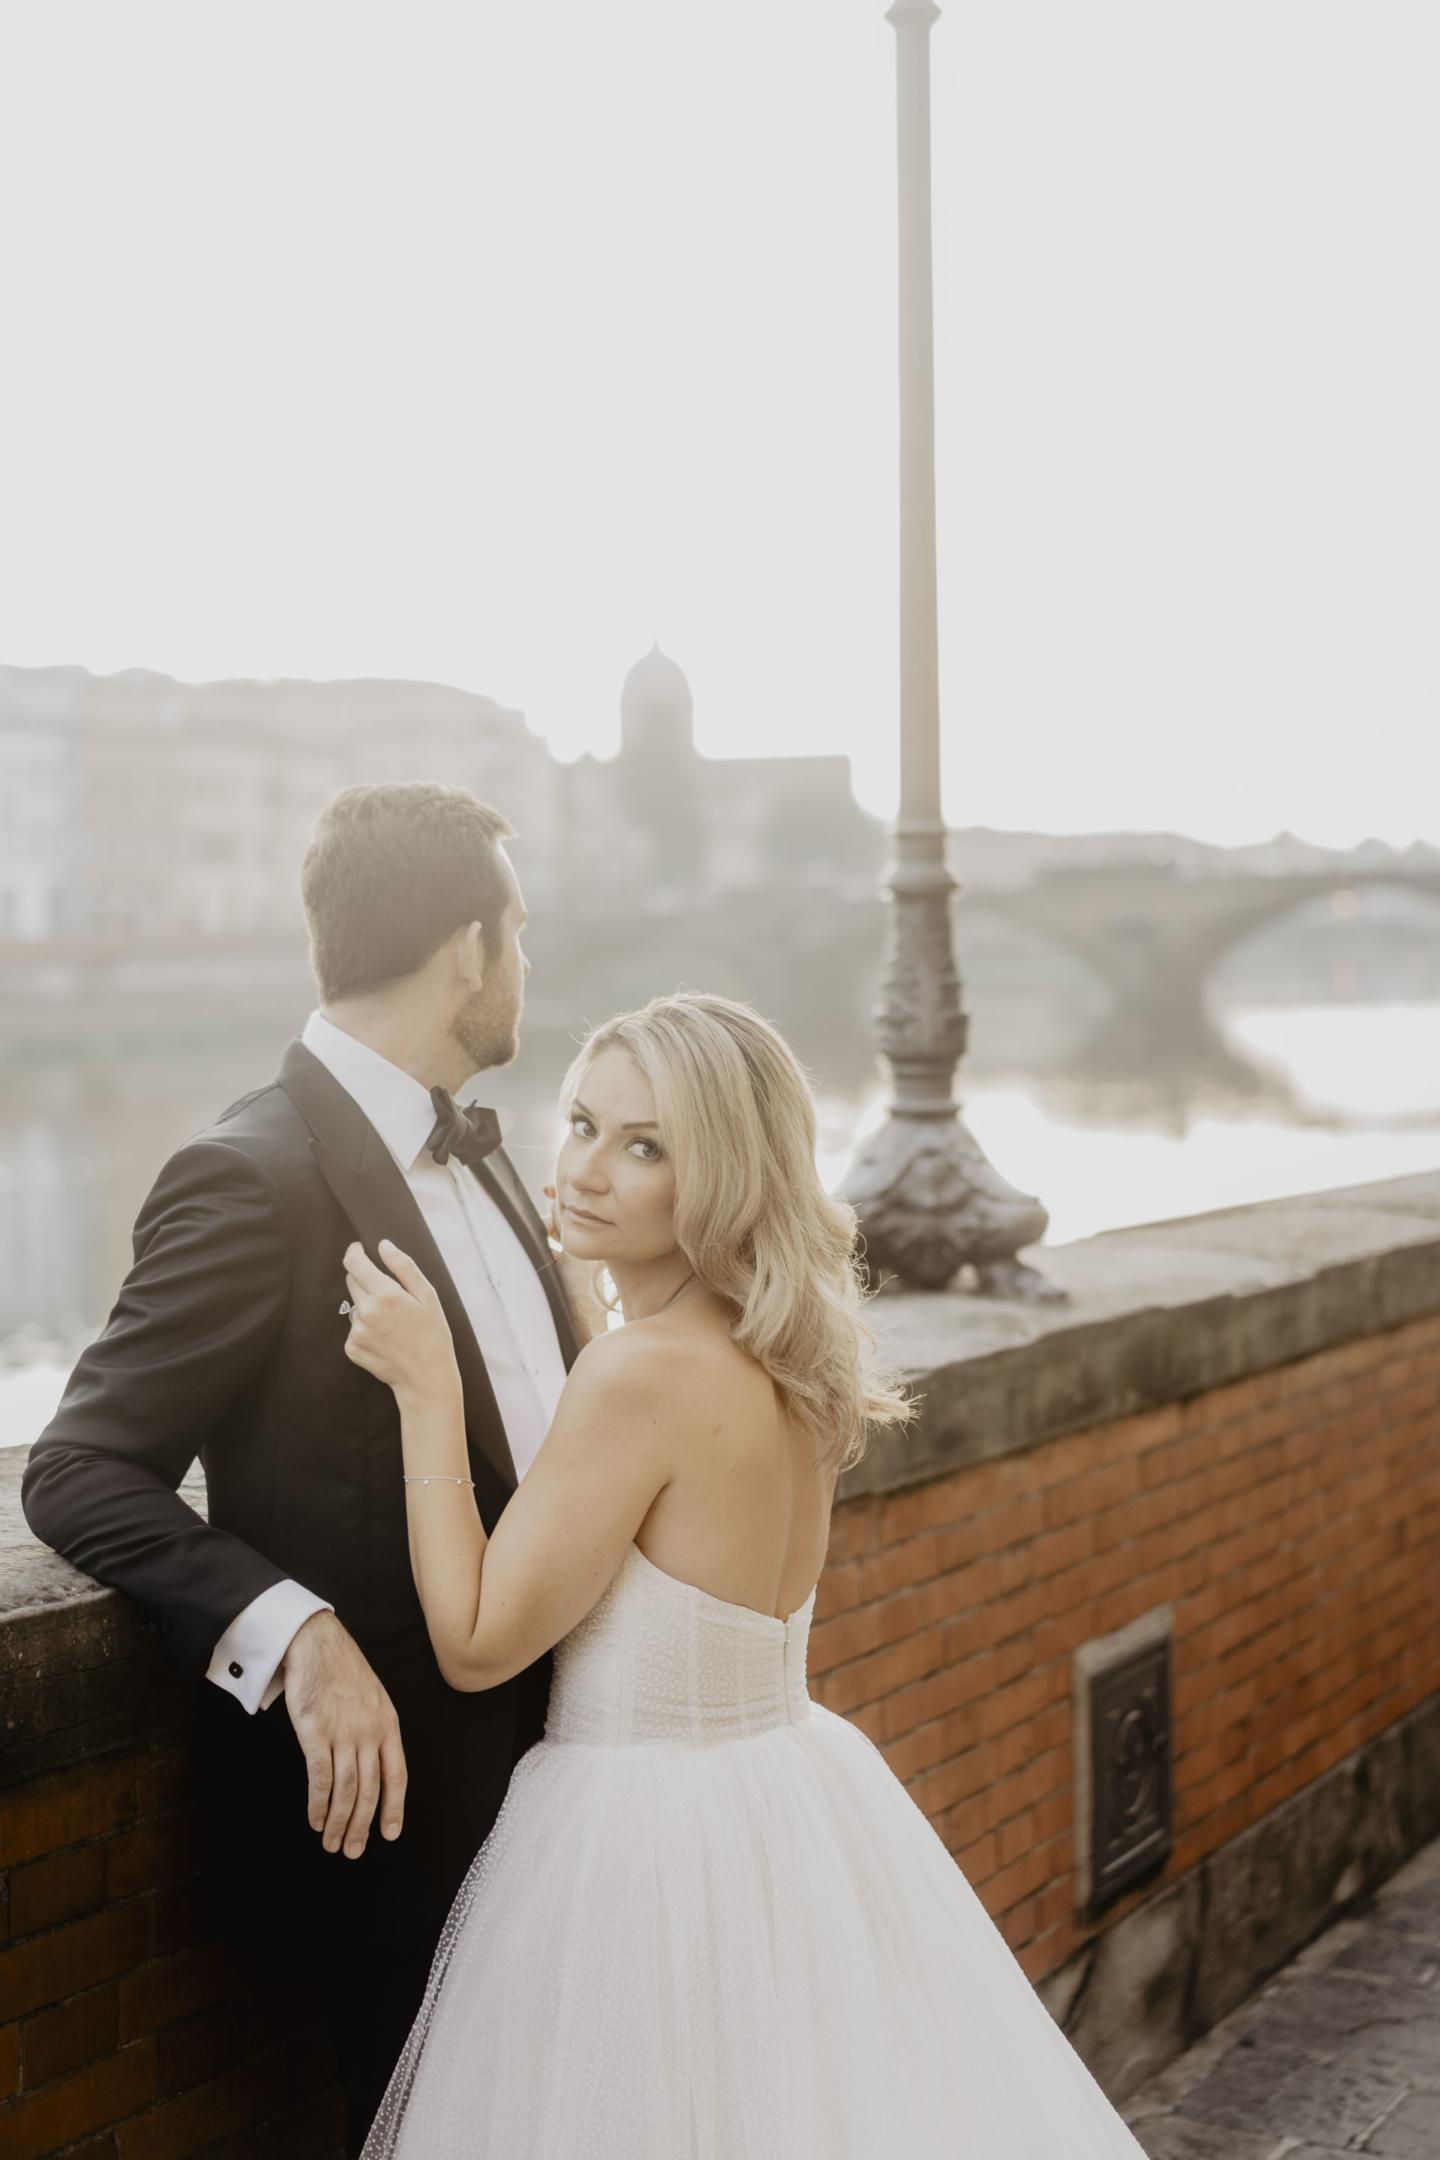 A sparkling wedding in the shore of the Arno - 48 :: A sparkling wedding on the shore of the Arno :: Luxury wedding photography - 47 :: A sparkling wedding in the shore of the Arno - 48